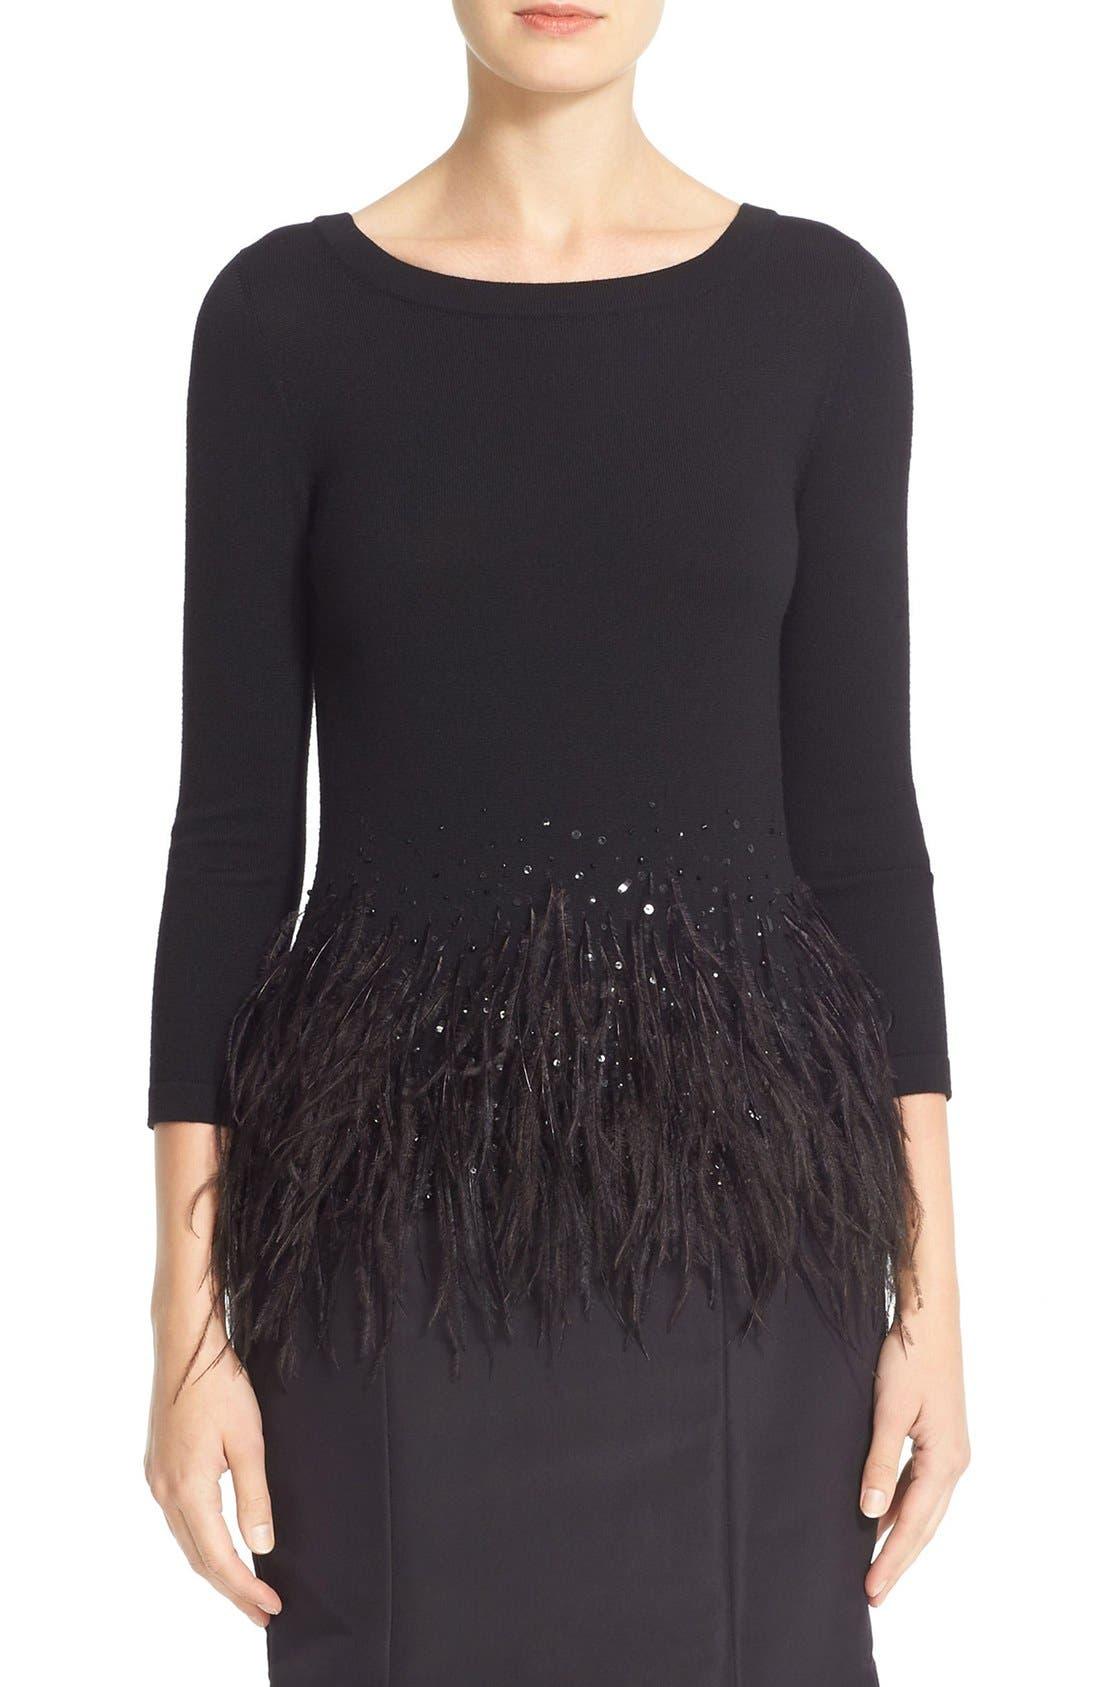 Alternate Image 1 Selected - Carolina Herrera Sequin & Feather Trim Wool Sweater